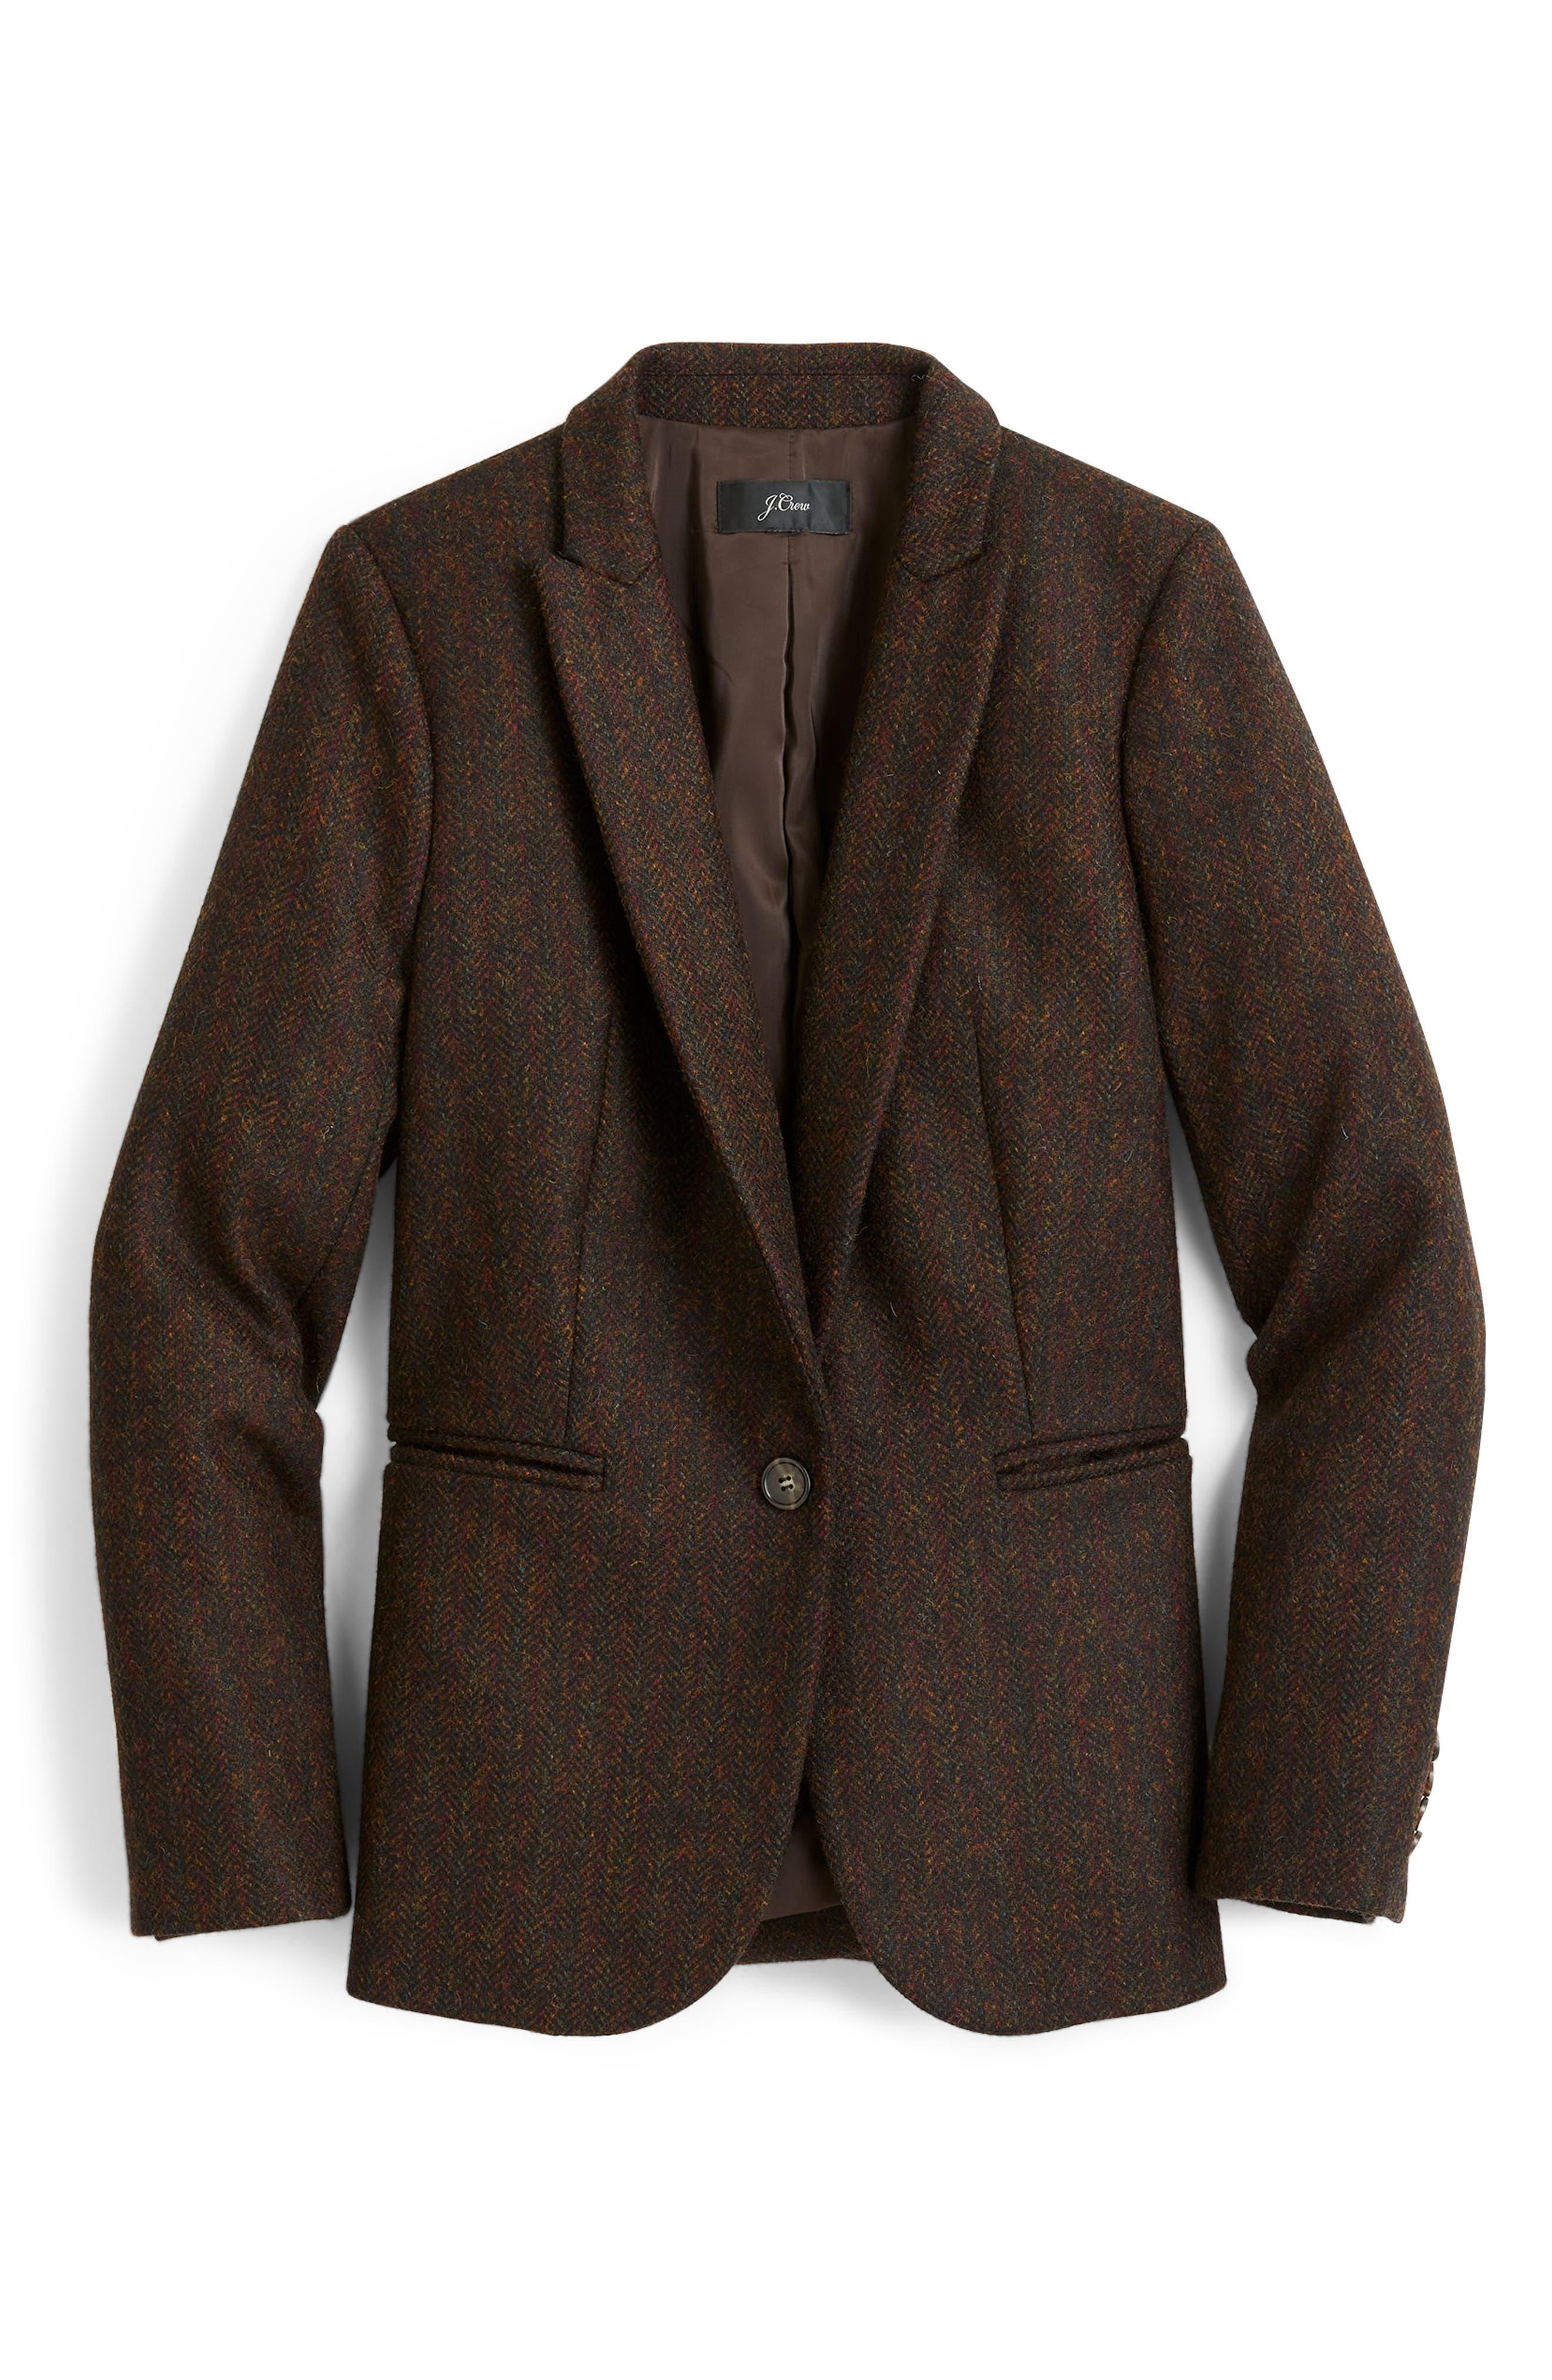 J.CREW, Parke Herringbone Wool Blazer, Alternate thumbnail 5, color, 009